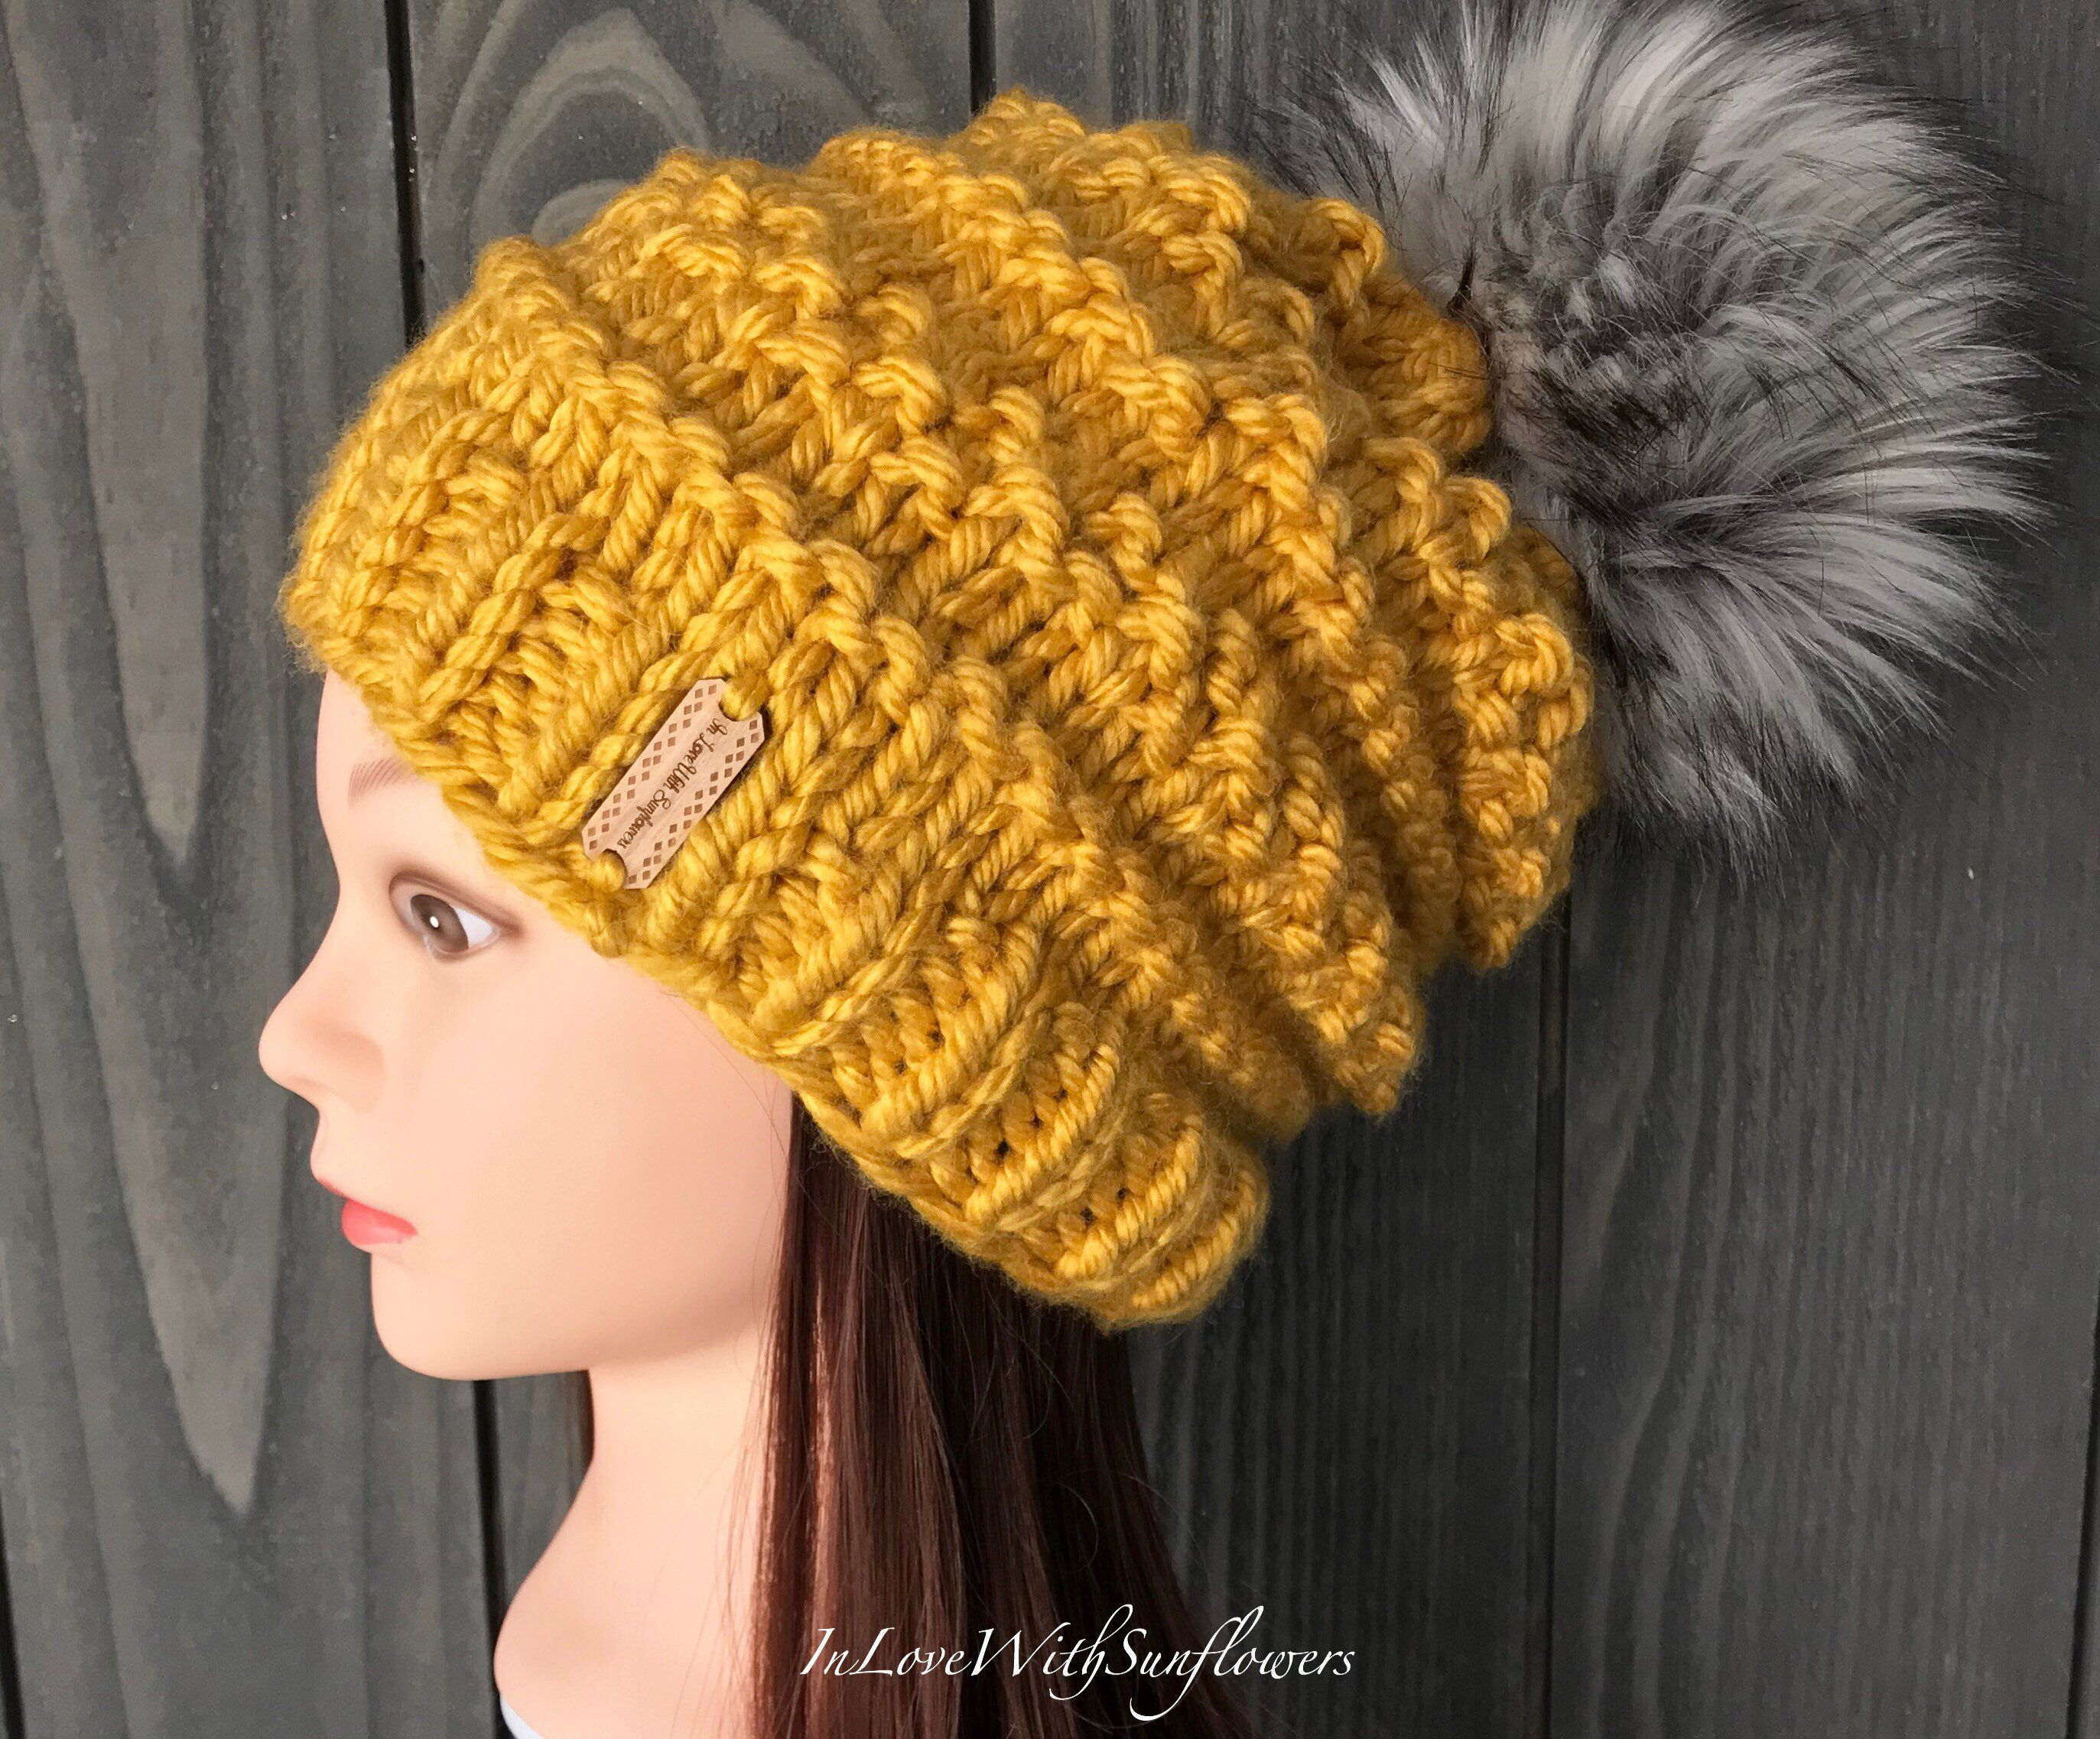 a8b1f5d8038 Knit Hat with Faux Fur Pom Pom - Mustard - Gold Chunky Knit Hat with  Removable vegan friendly fake fur pom pom - Slouchy Beanie -